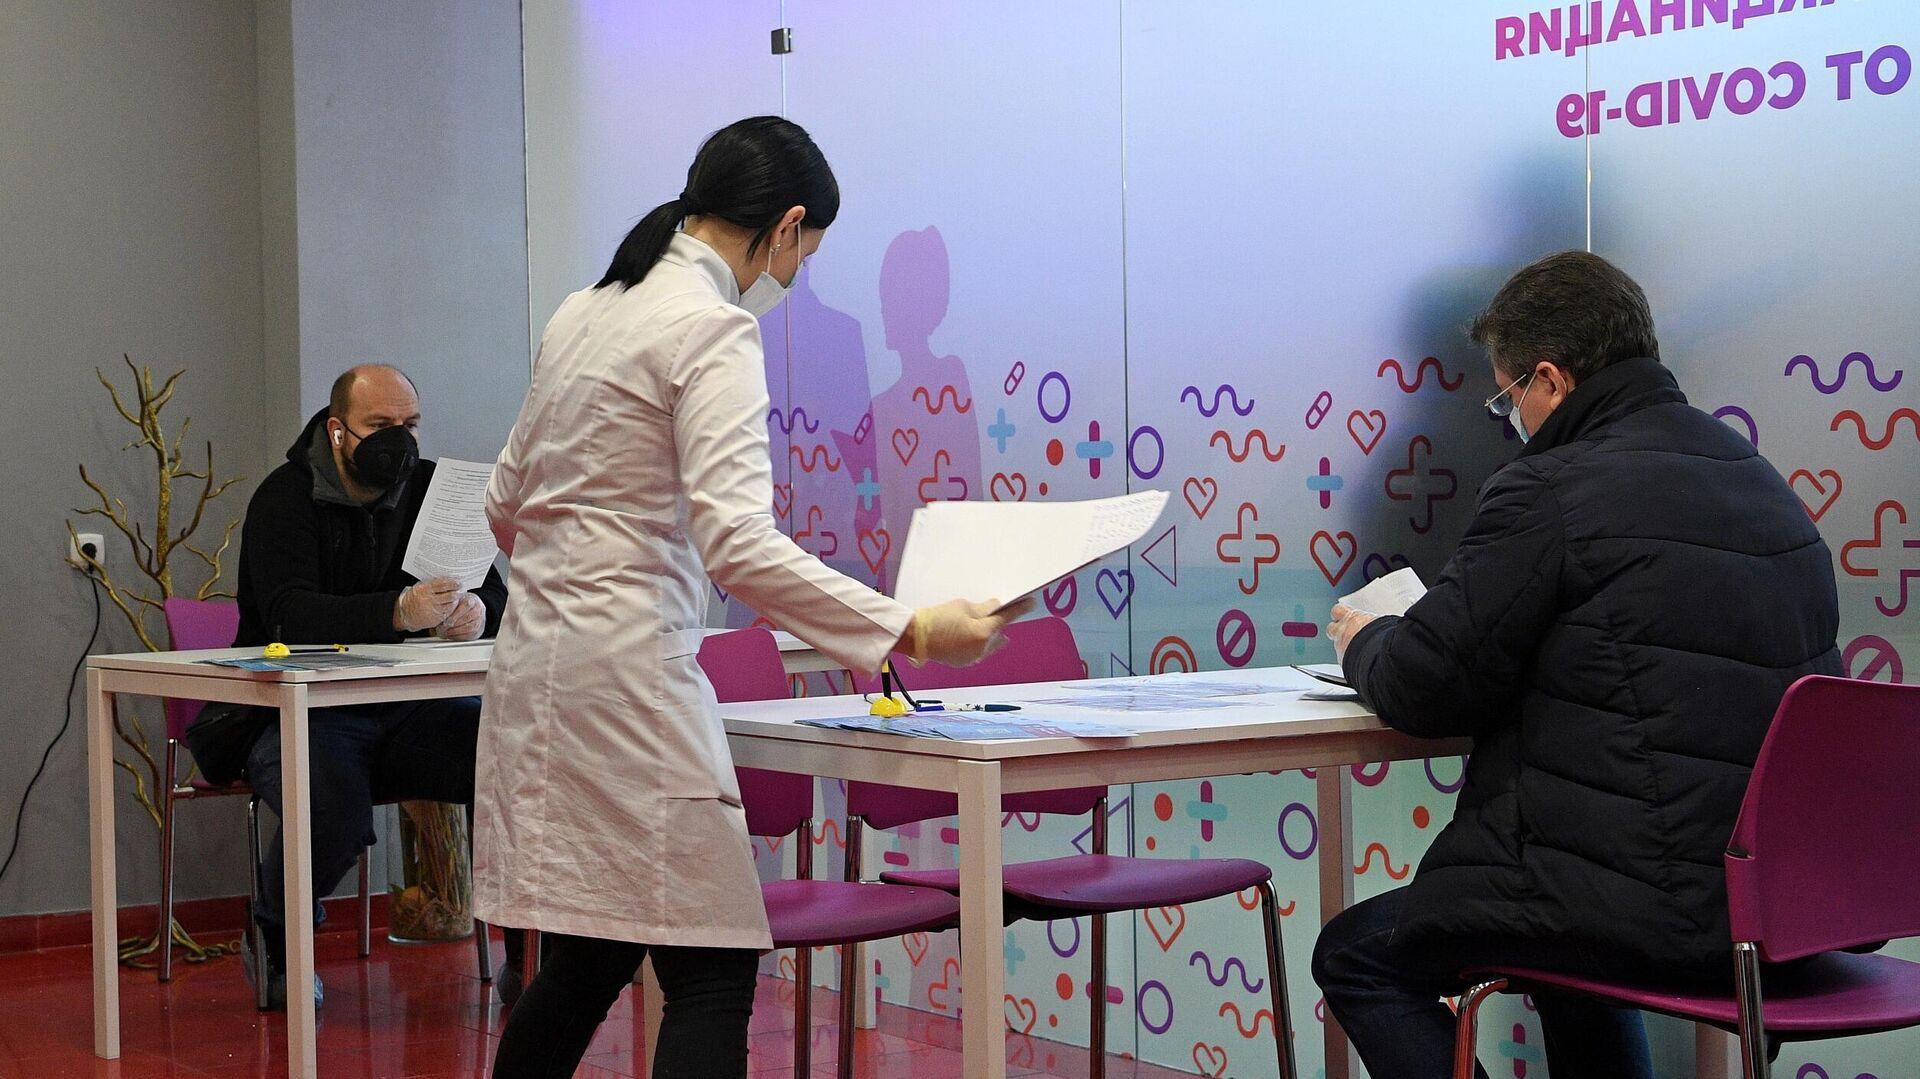 Мужчины заполняют анкеты перед вакцинацией от COVID-19 в пункте вакцинации в торговом центре РИО в Москве - РИА Новости, 1920, 23.03.2021